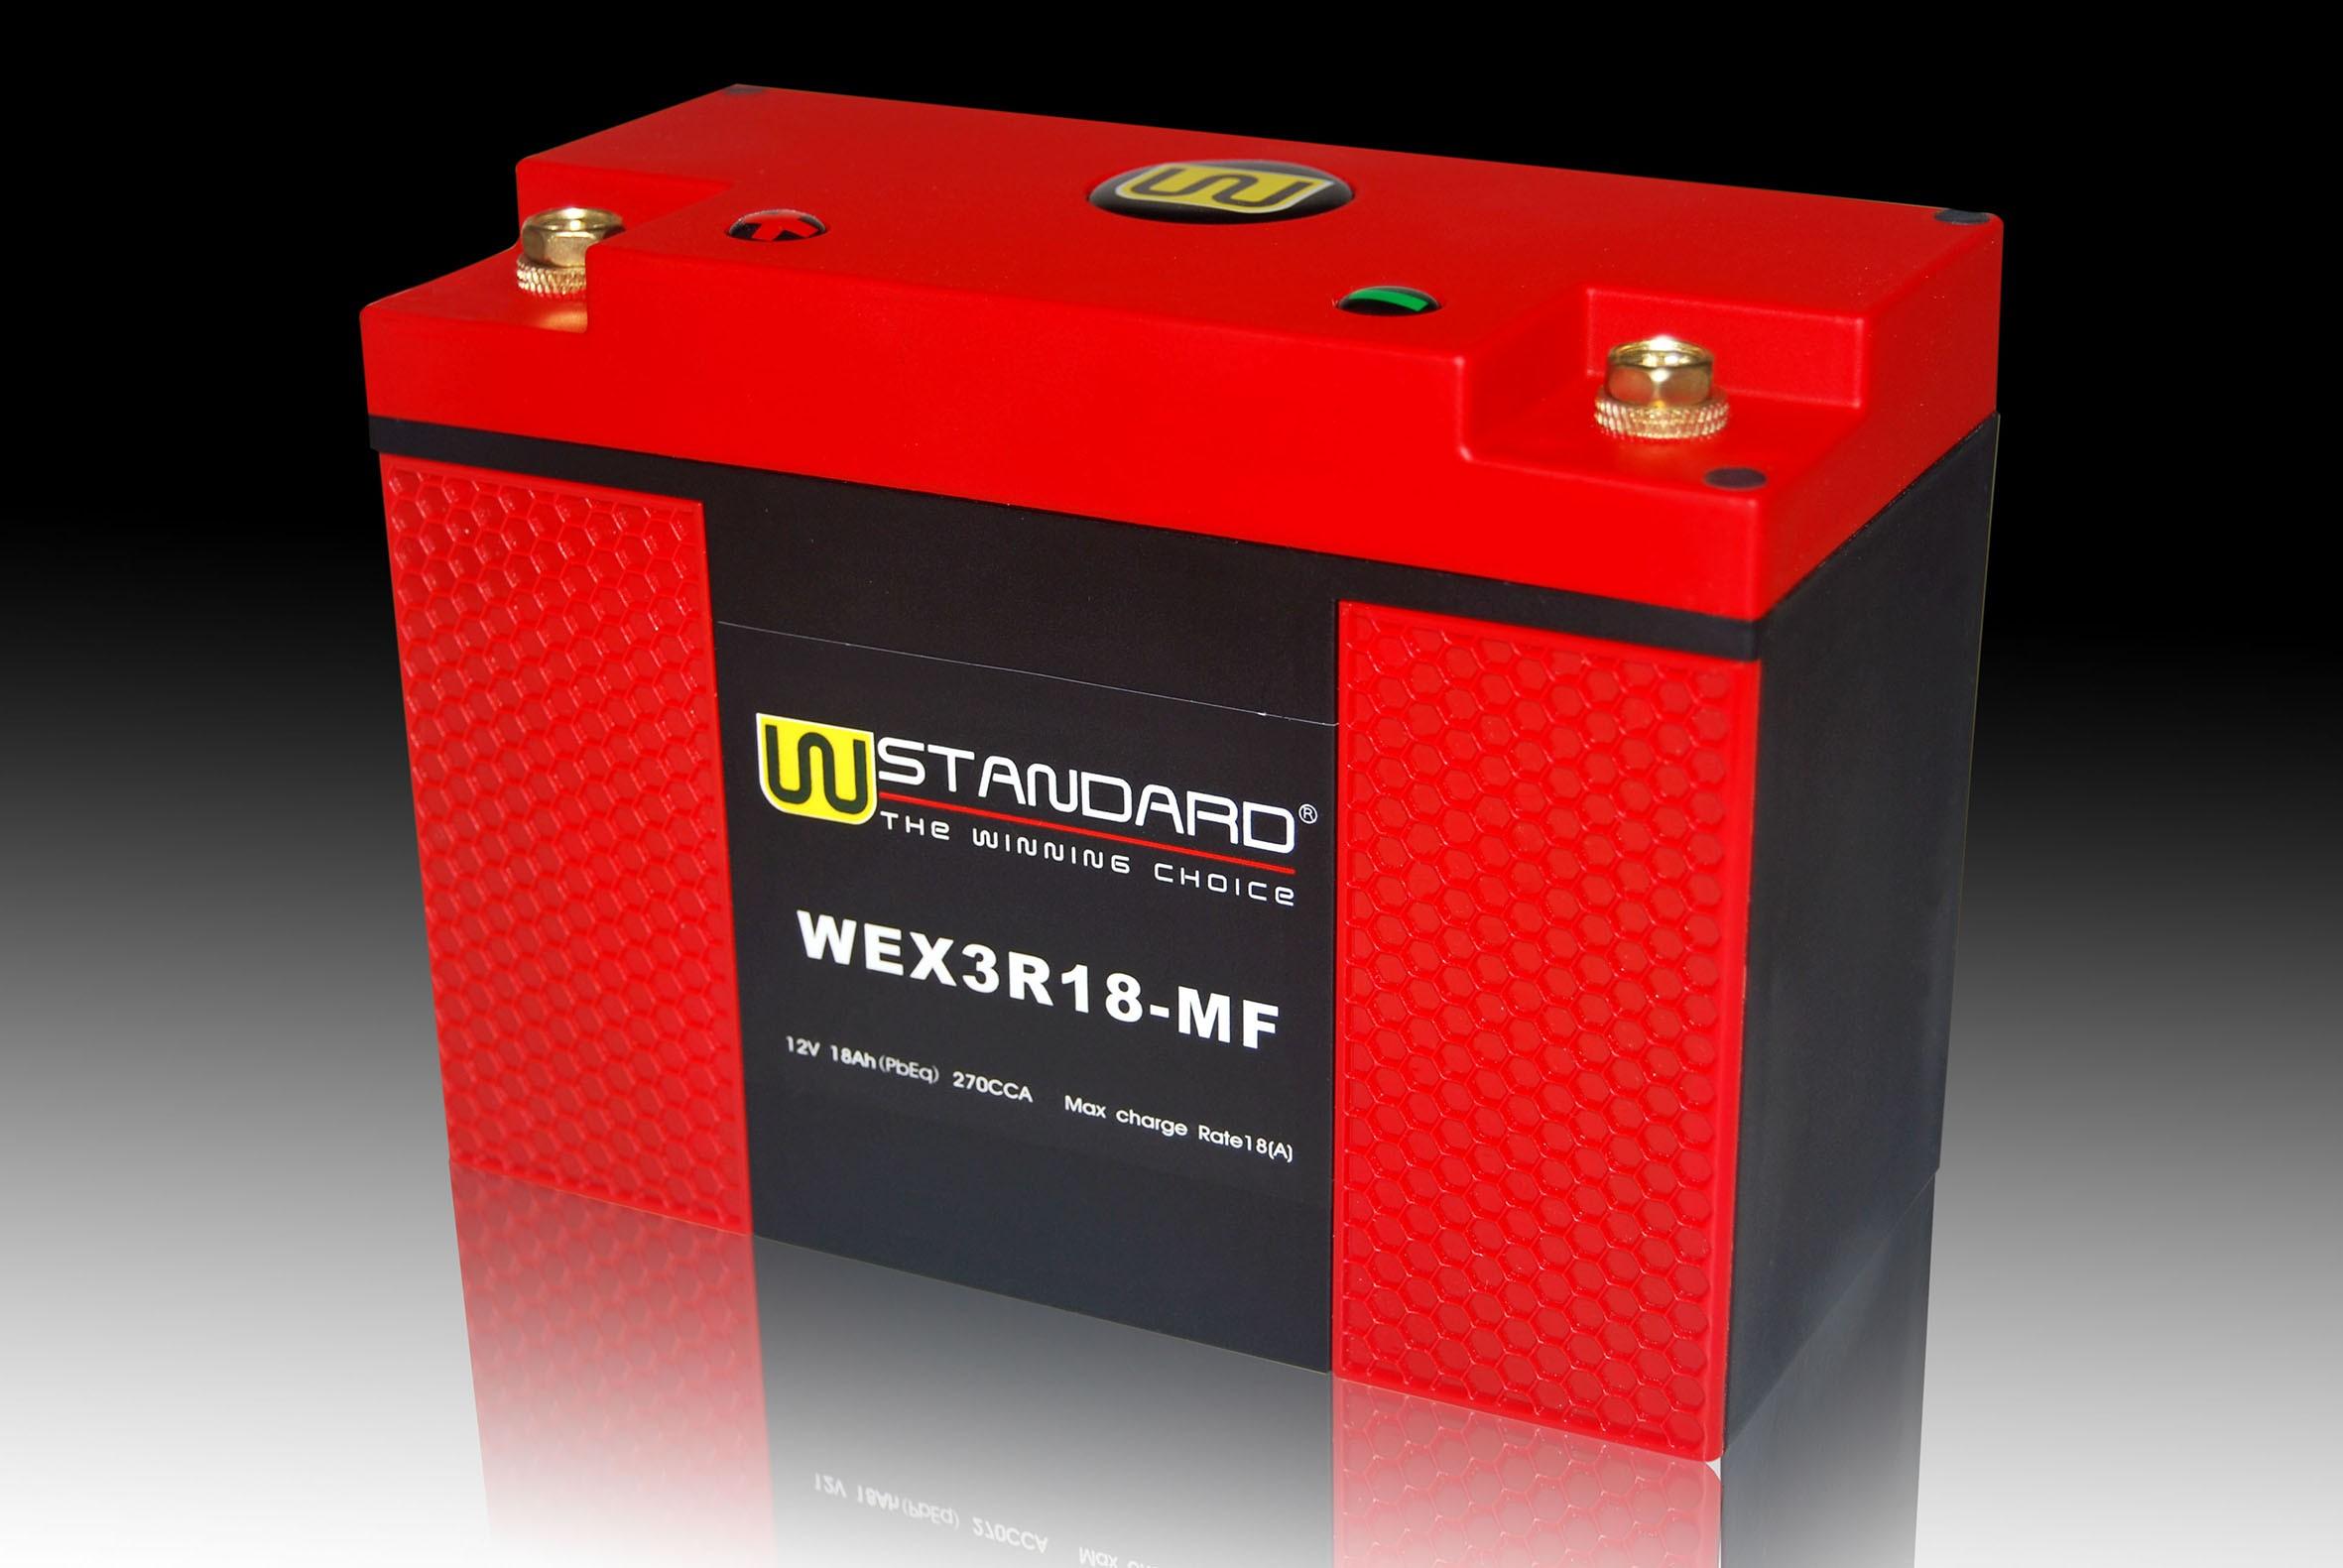 WEX3R18-MF